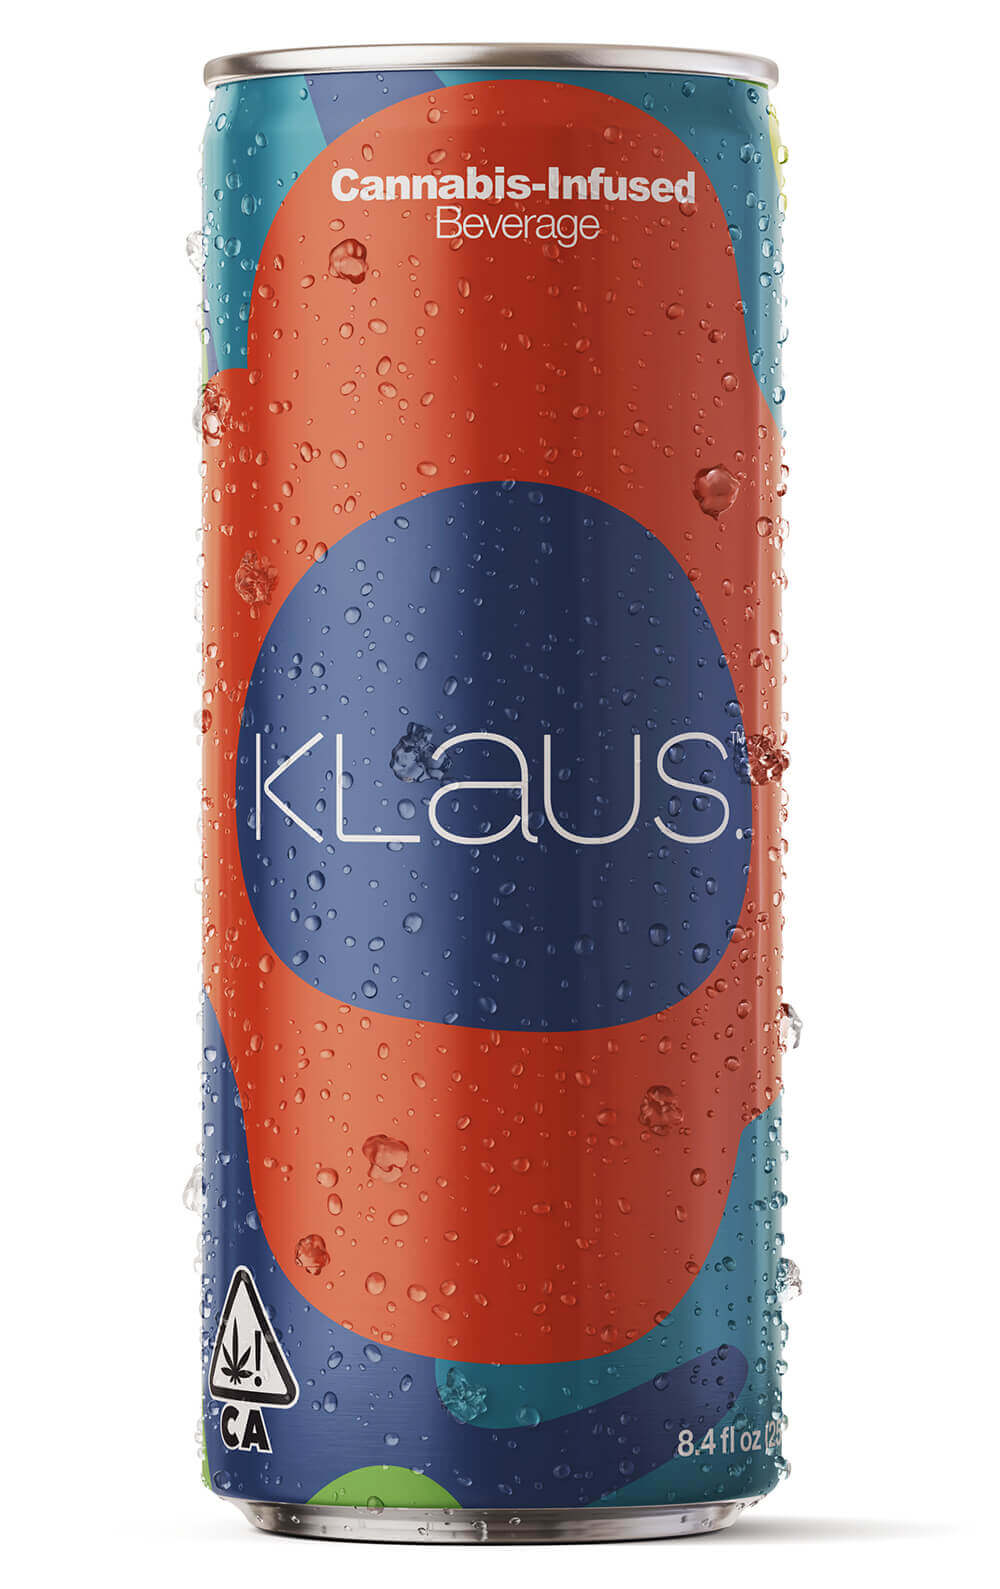 Klaus Bosphorus